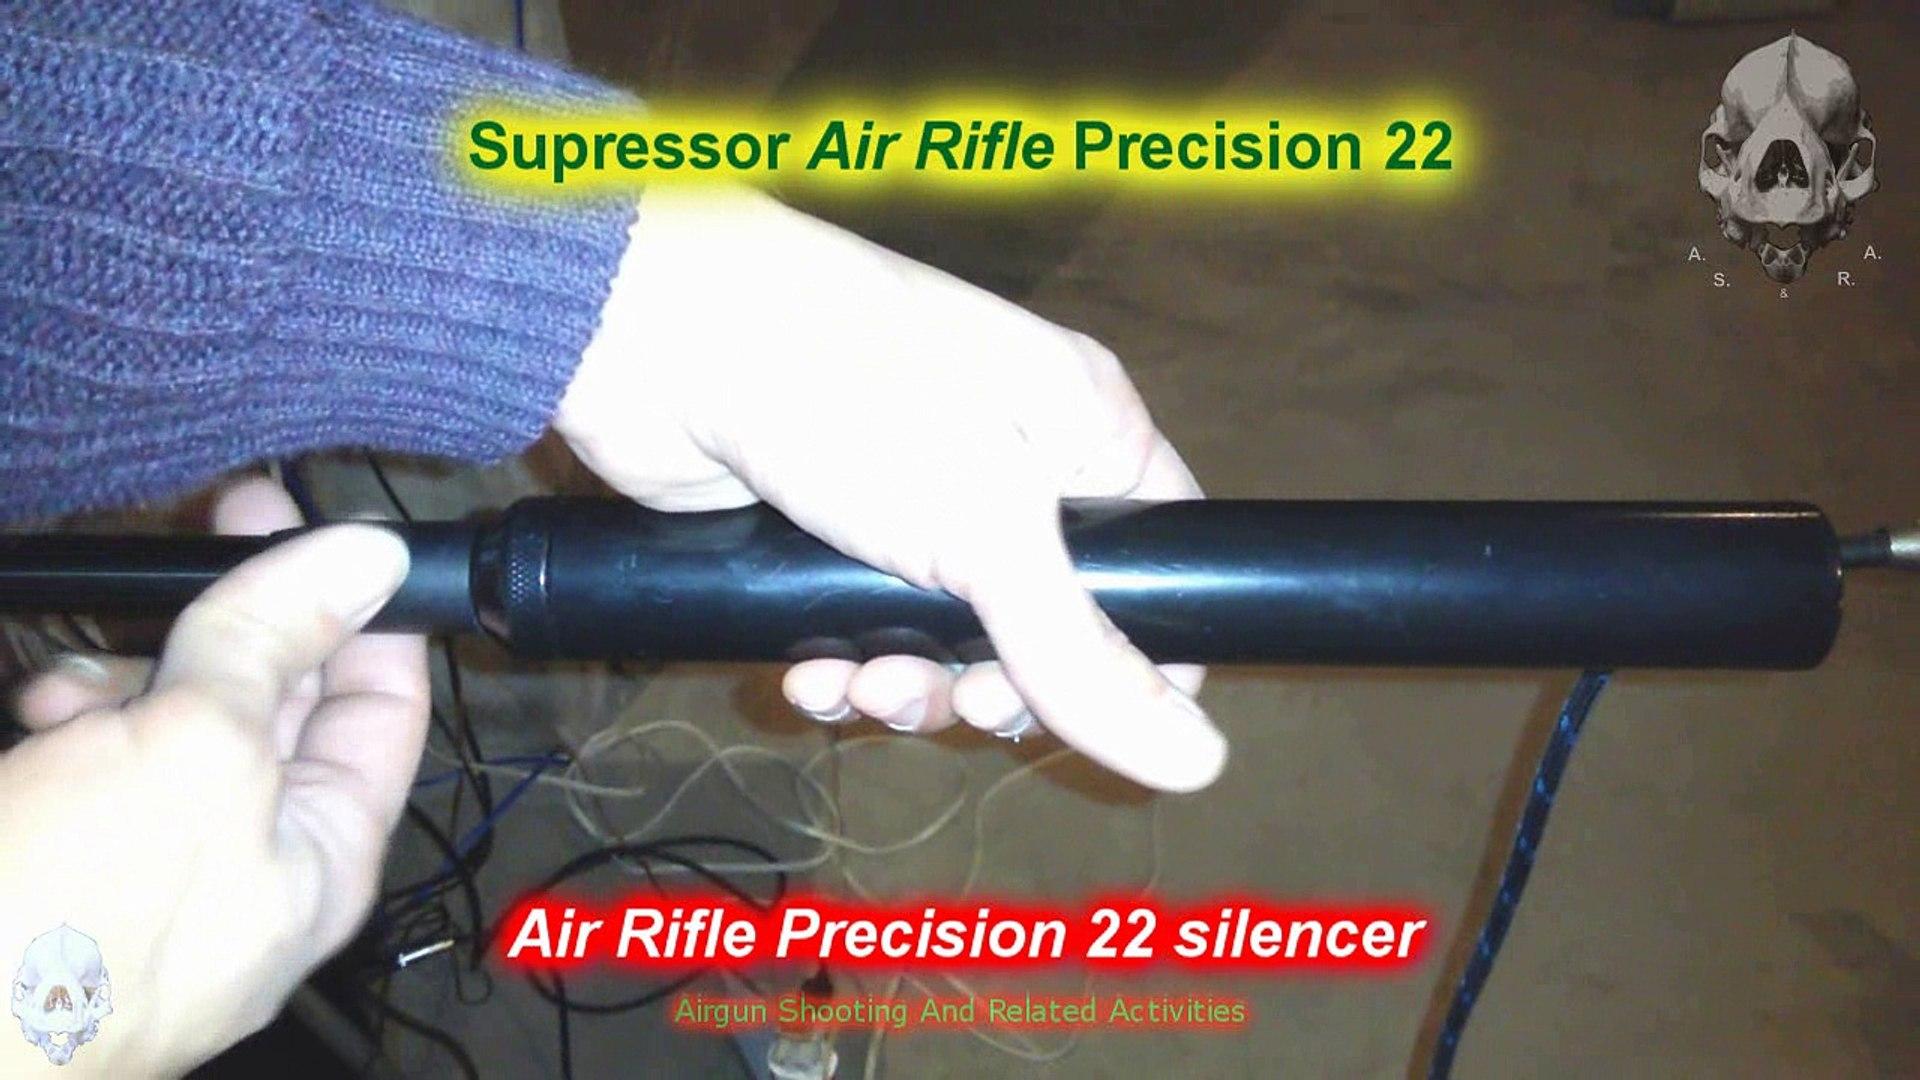 Air Rifle Silencers Comparison, Weihrauch HW100  22 PCP Air Rifle -  Comparação de Supressores